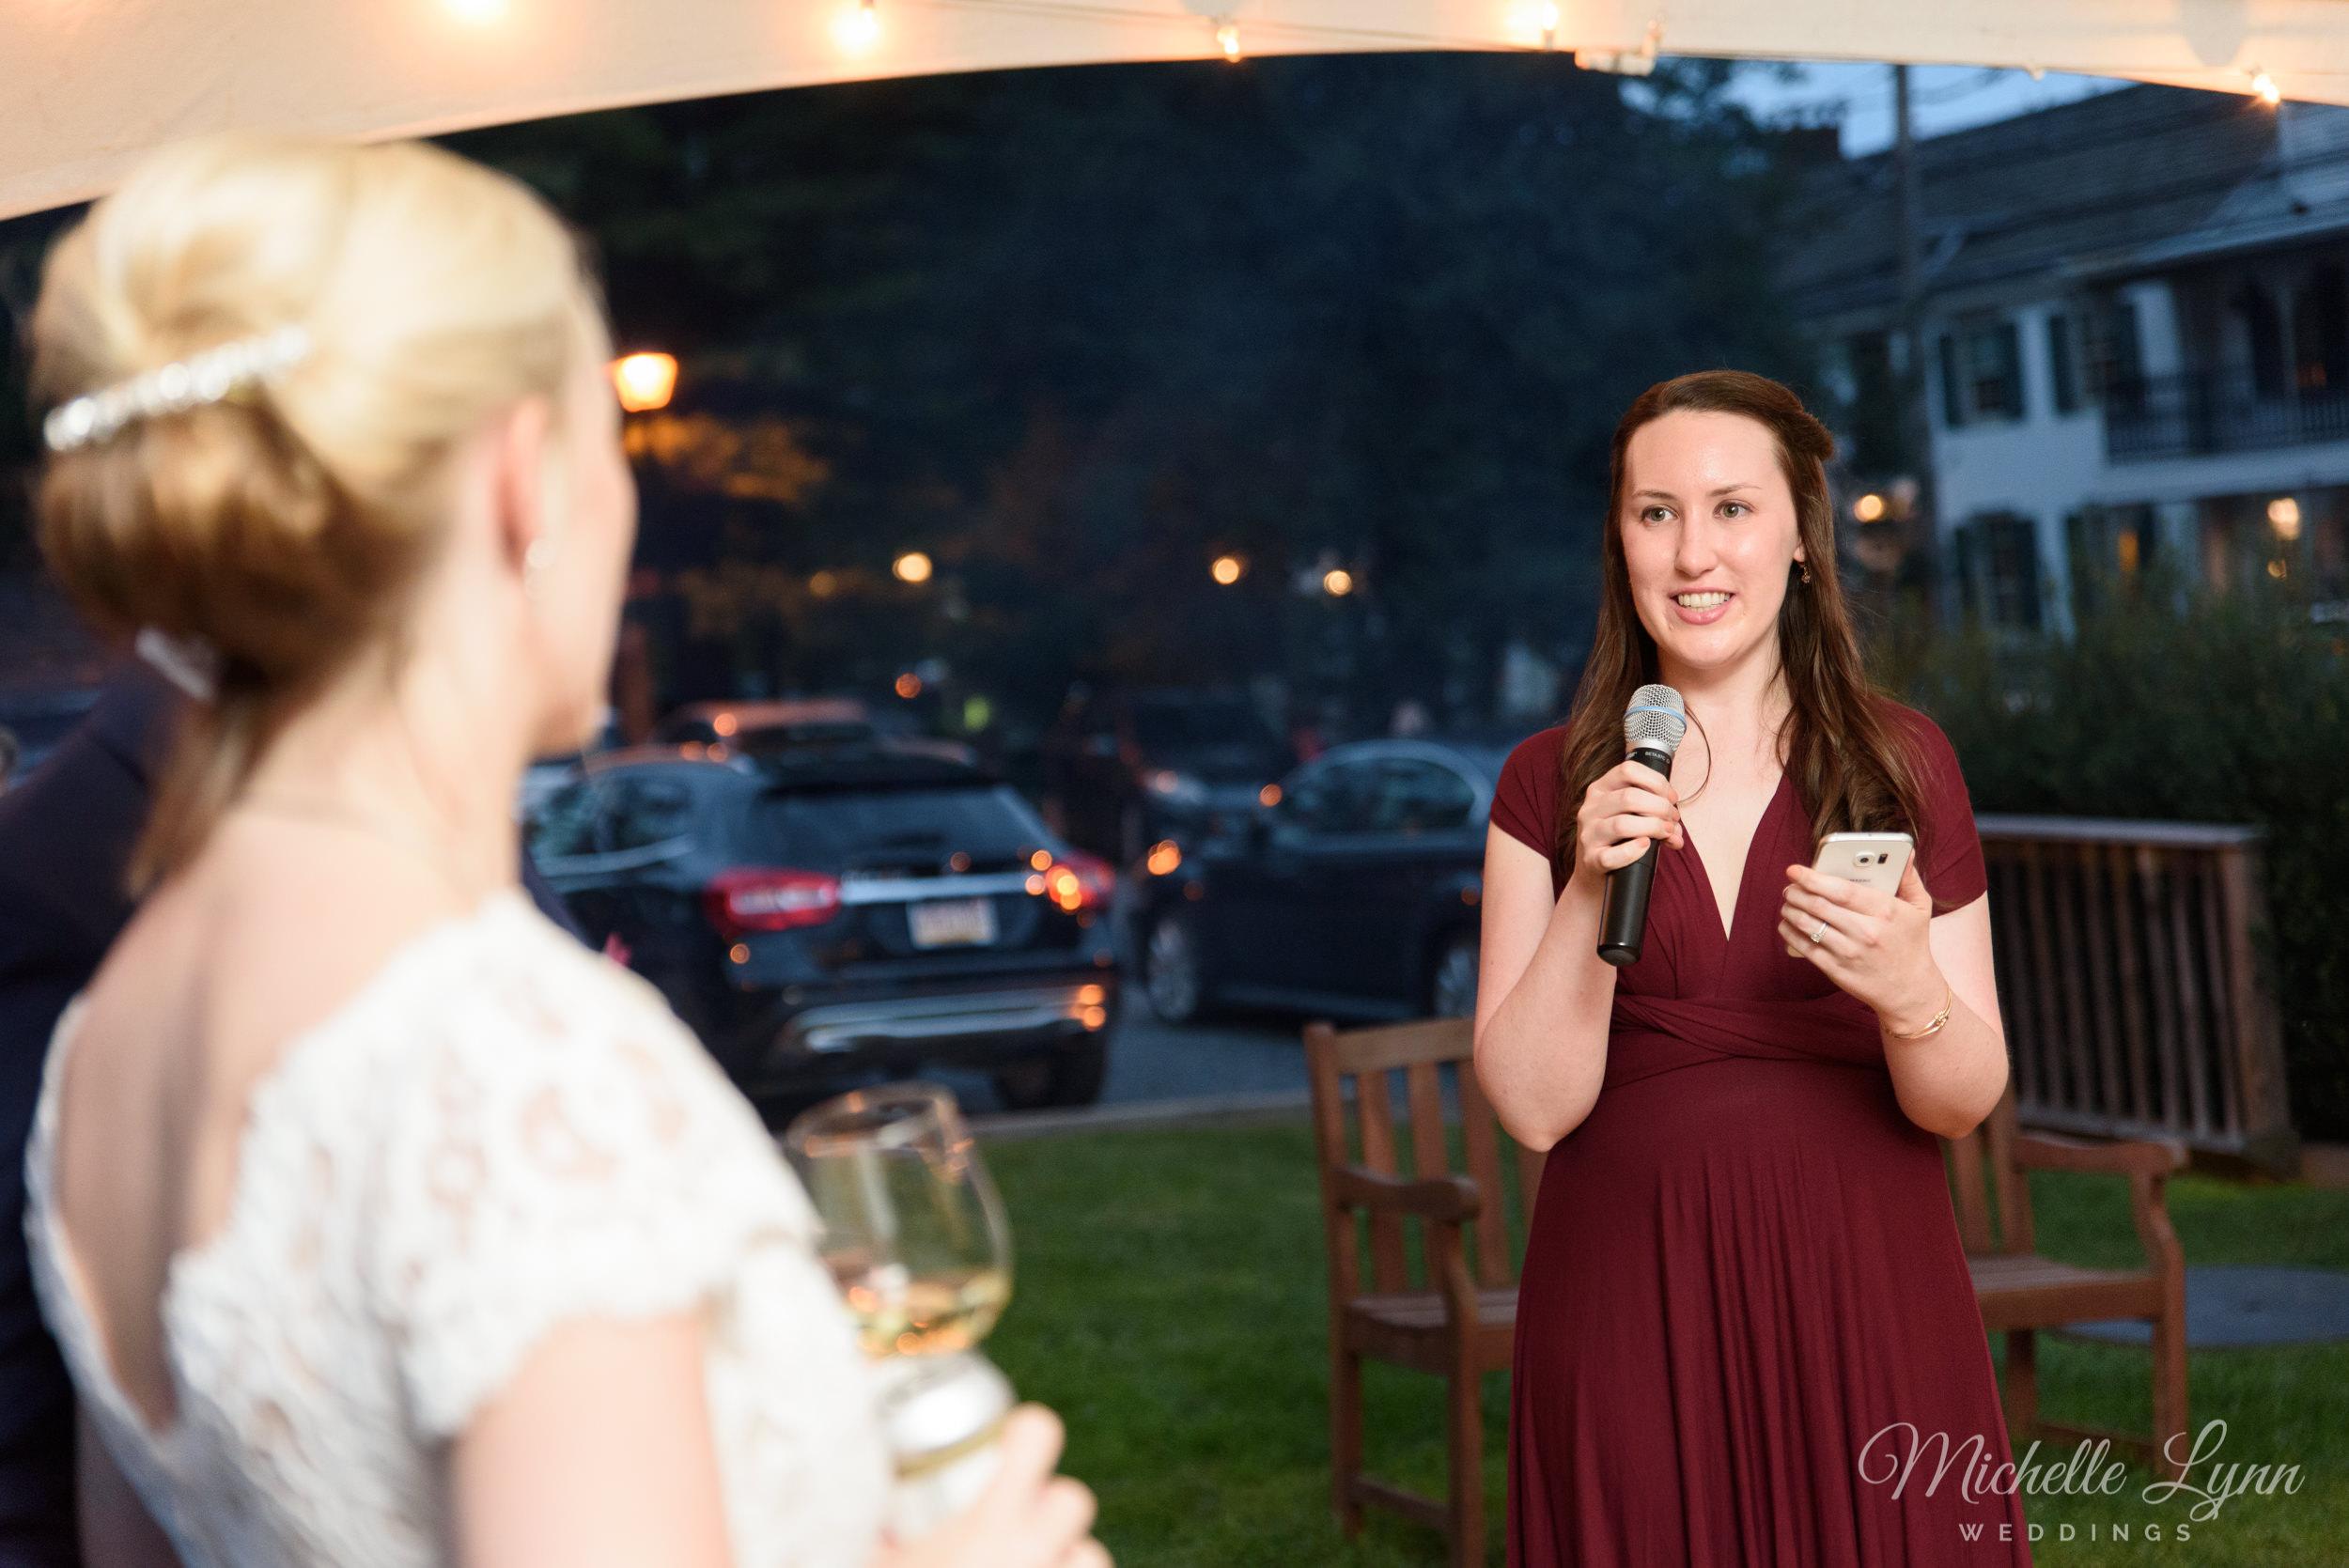 mlw-lumberville-general-store-new-hope-wedding-photographer-60.jpg